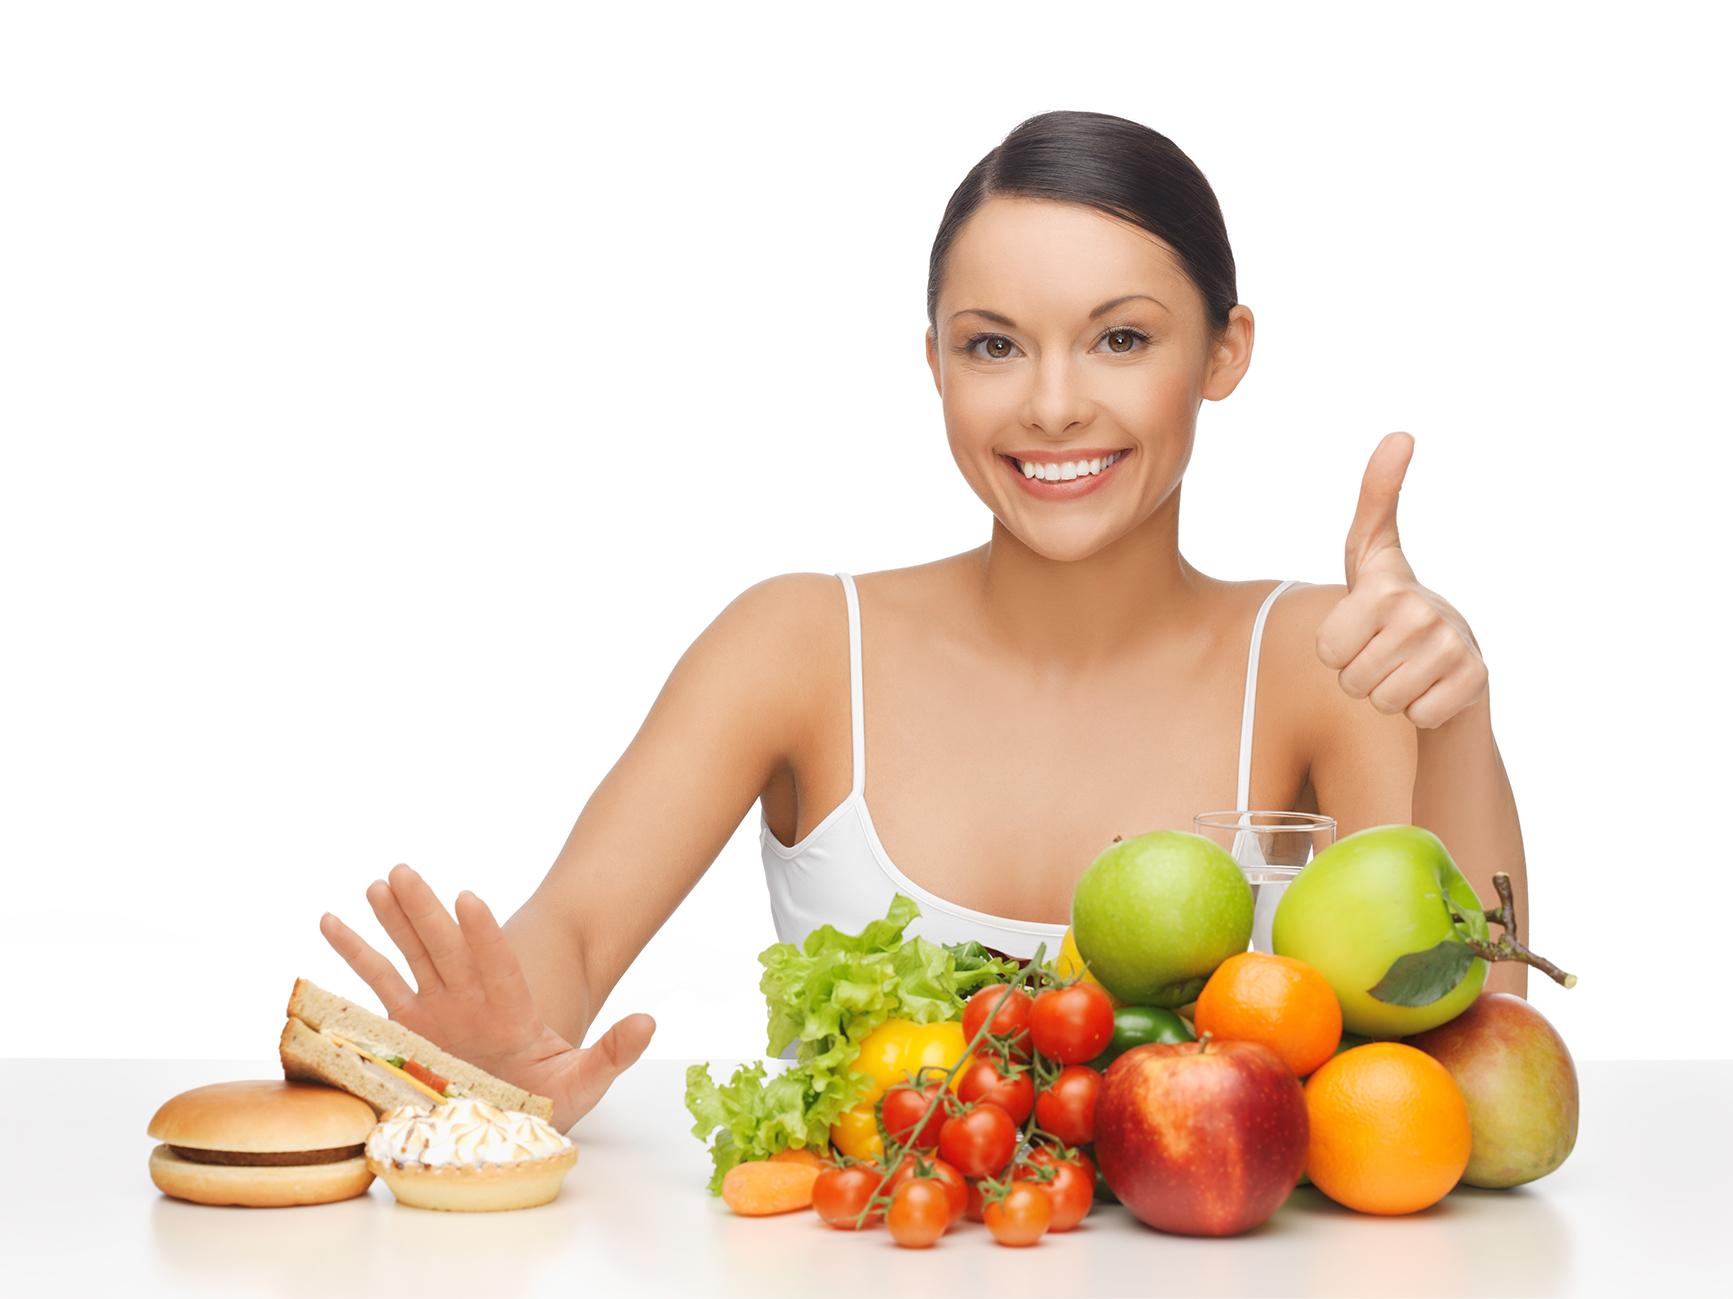 dieta sana viso riposato e luminoso